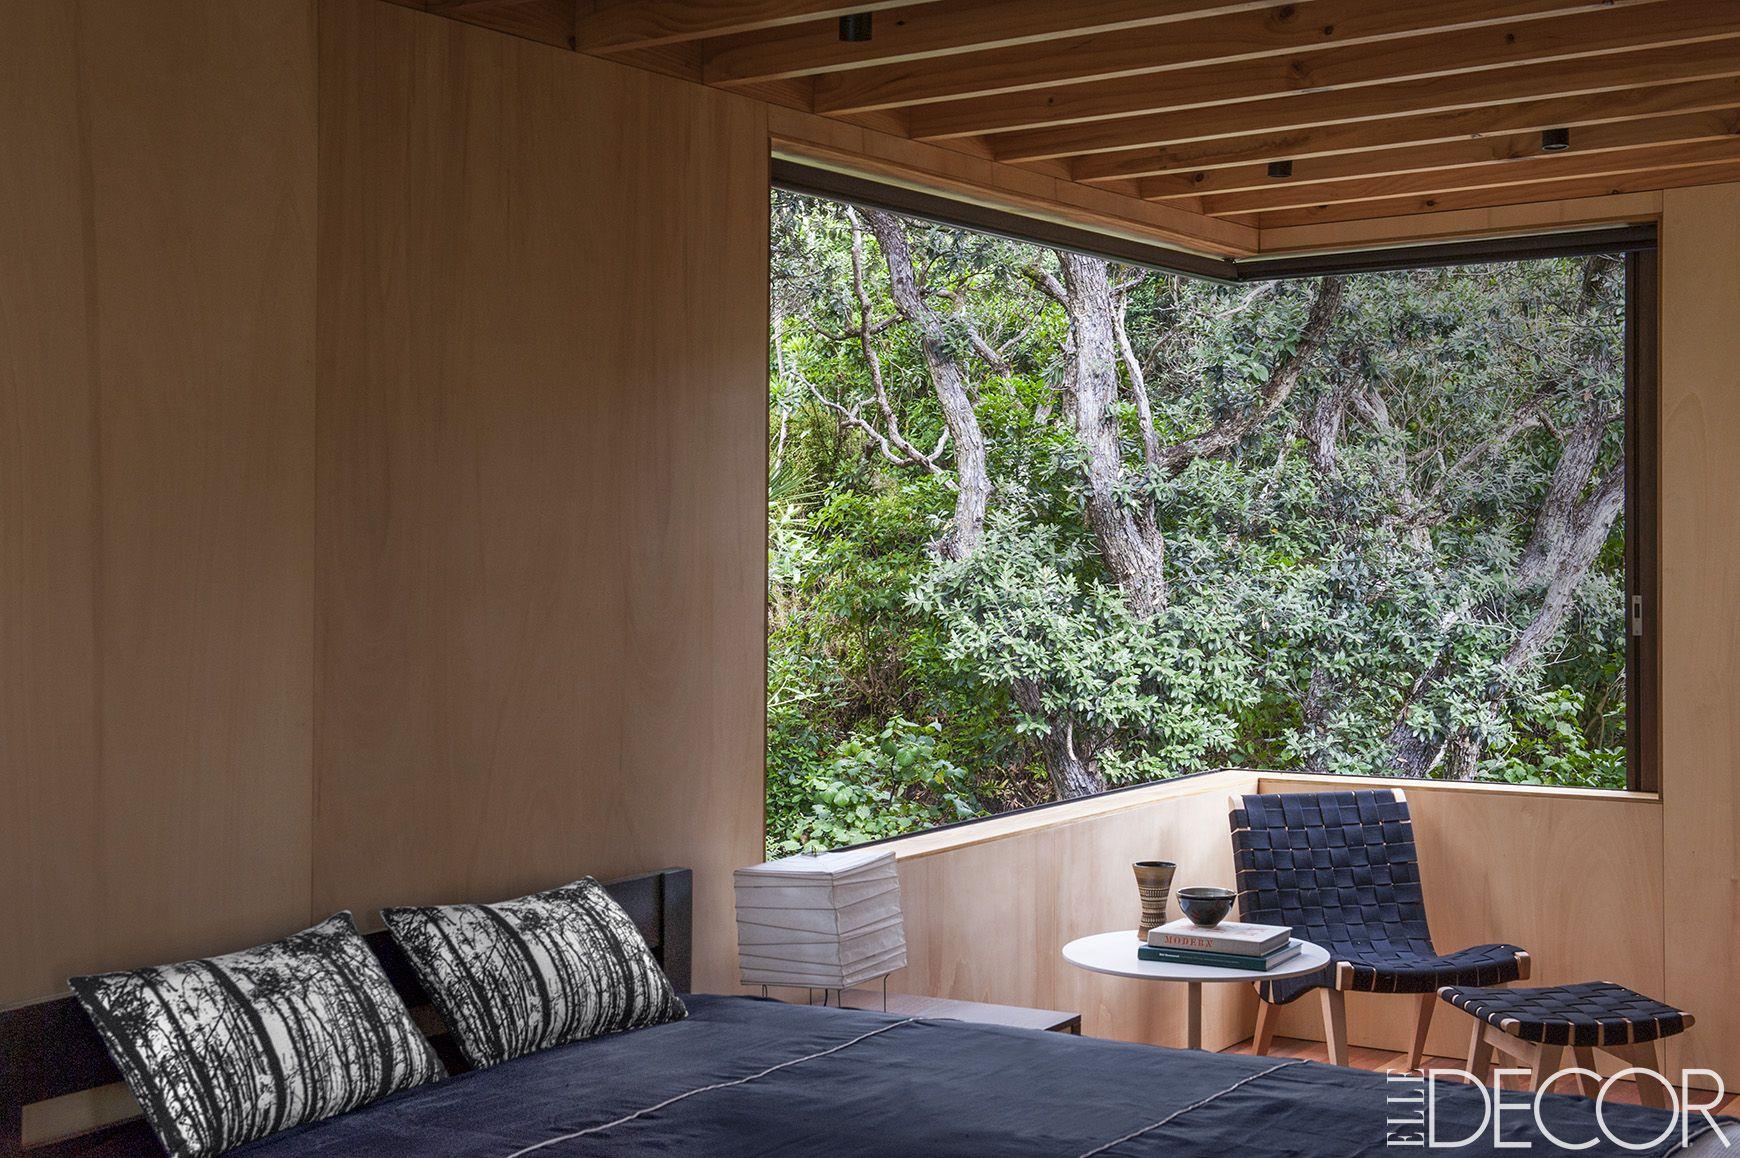 25 Minimalist Bedroom Decor Ideas   Modern Designs For Minimalist Bedrooms